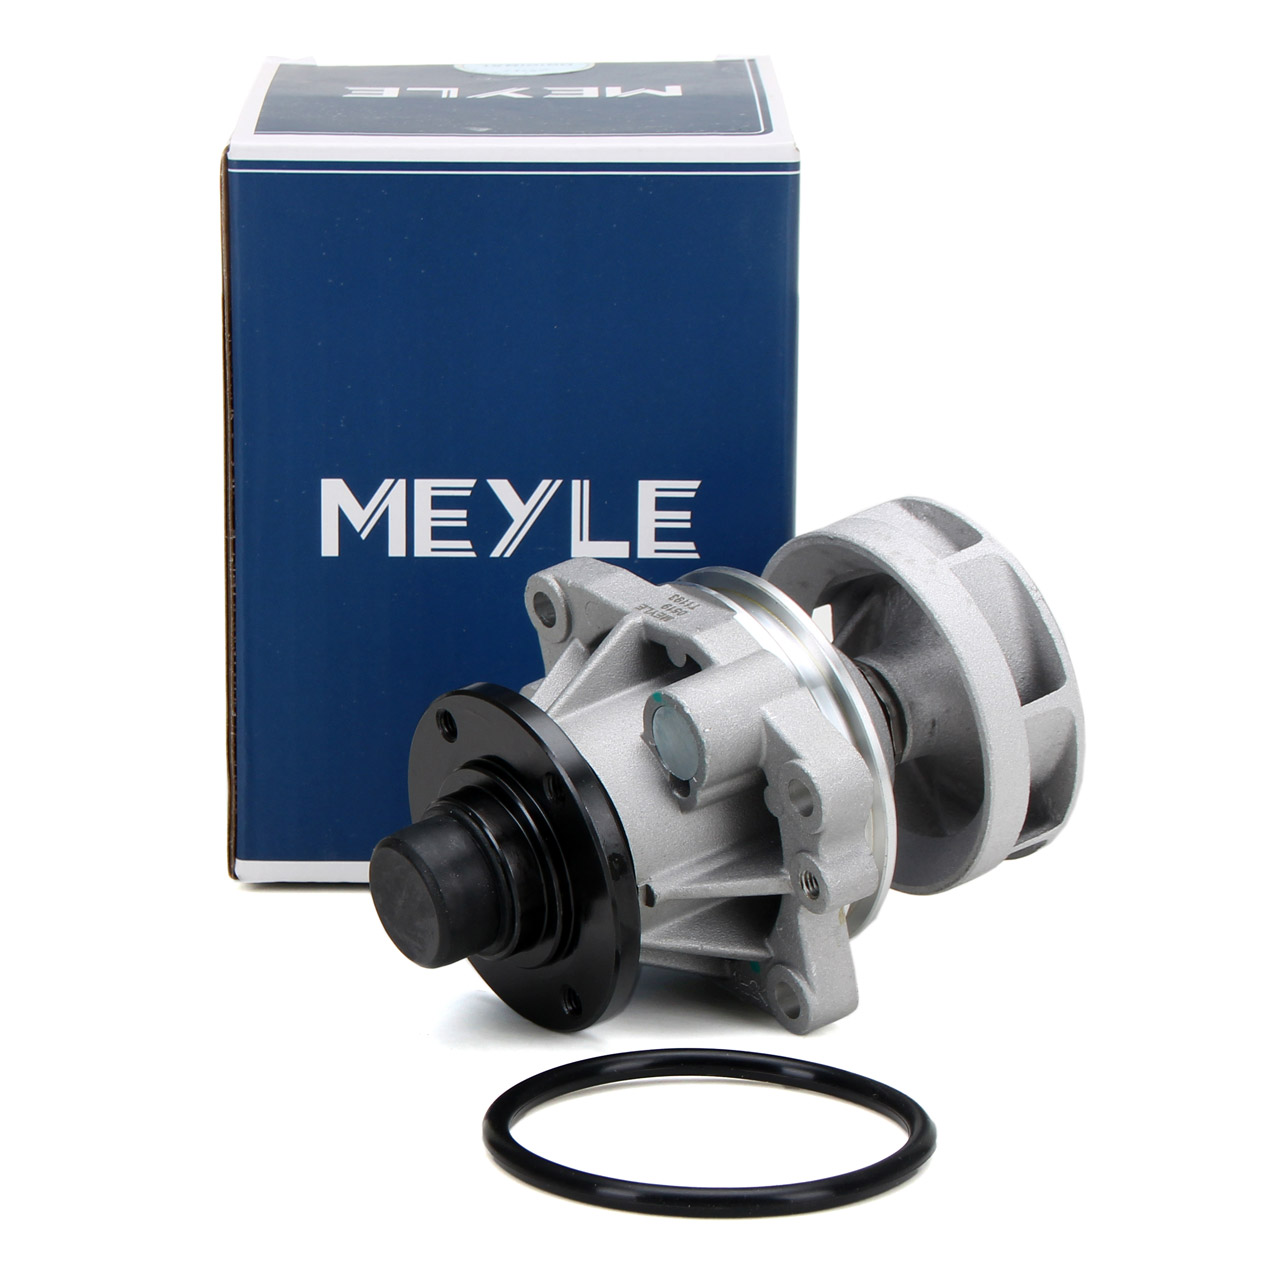 MEYLE Wasserpumpe BMW E36 E46 E34 E39 E60 E61 E38 E65-67 X3 X5 M50 M52 M54